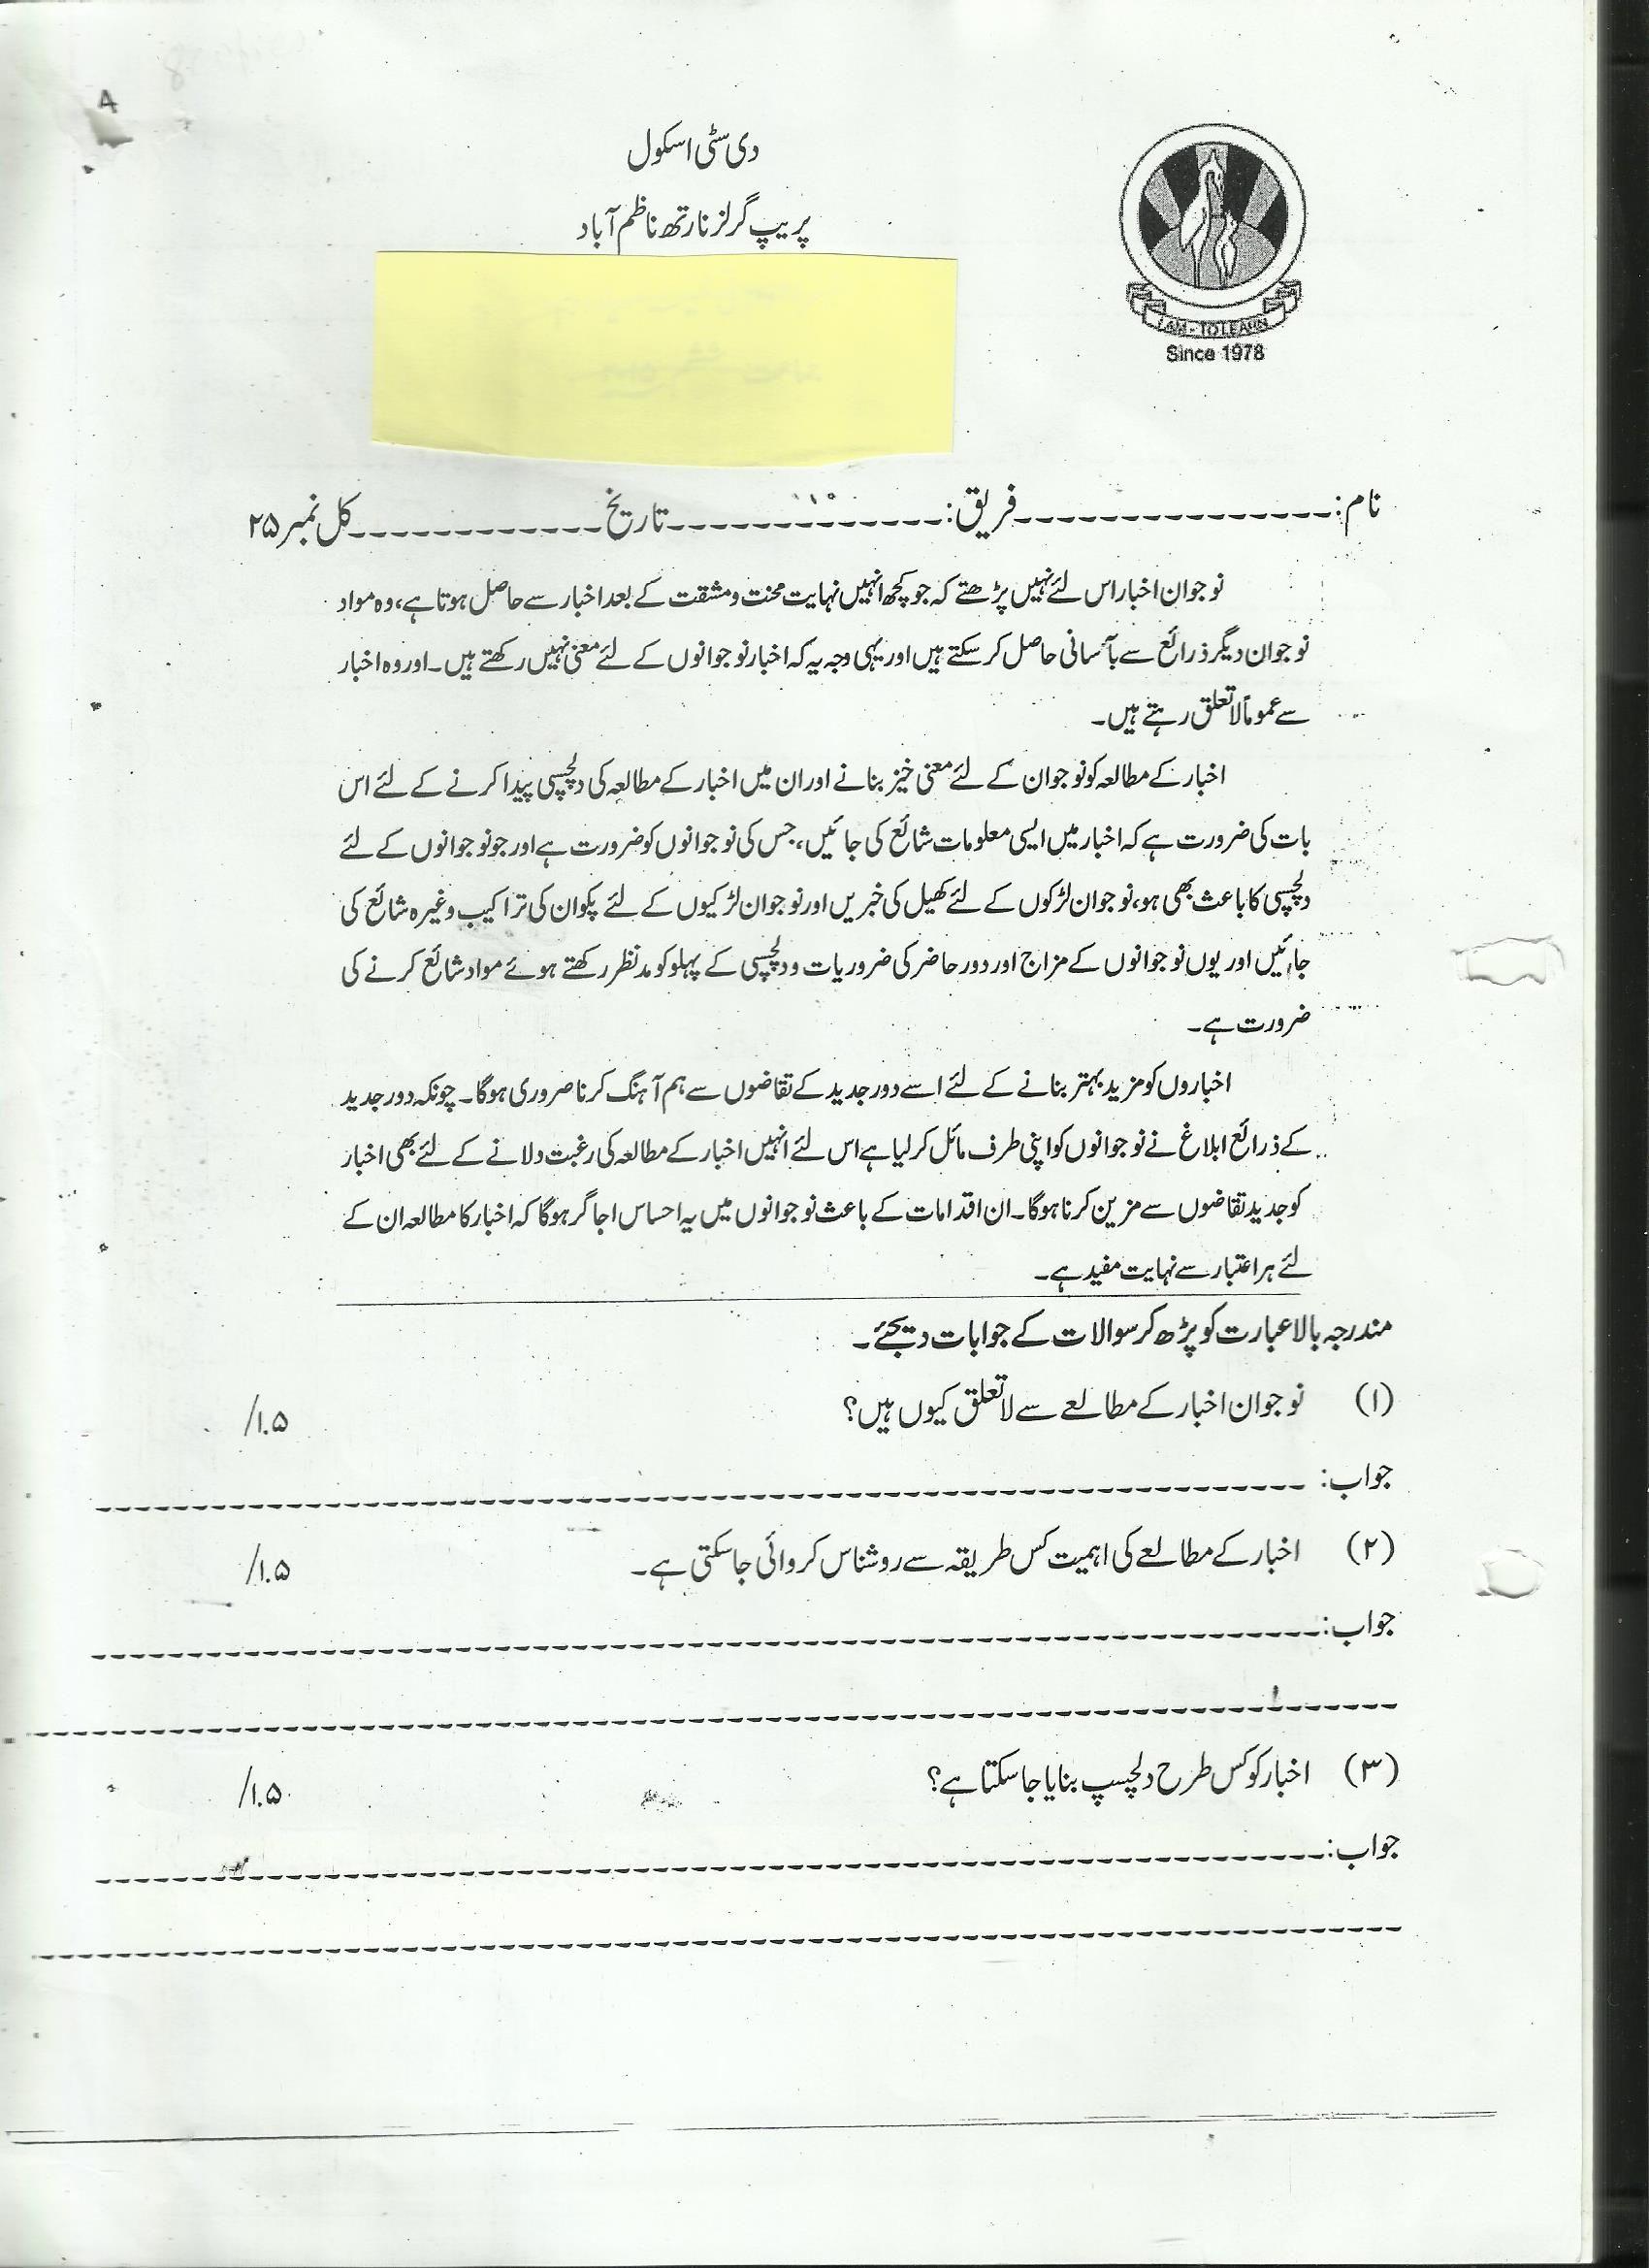 - Urdu Tafheem Worksheets For Grade 4 #401902 - Worksheets Library